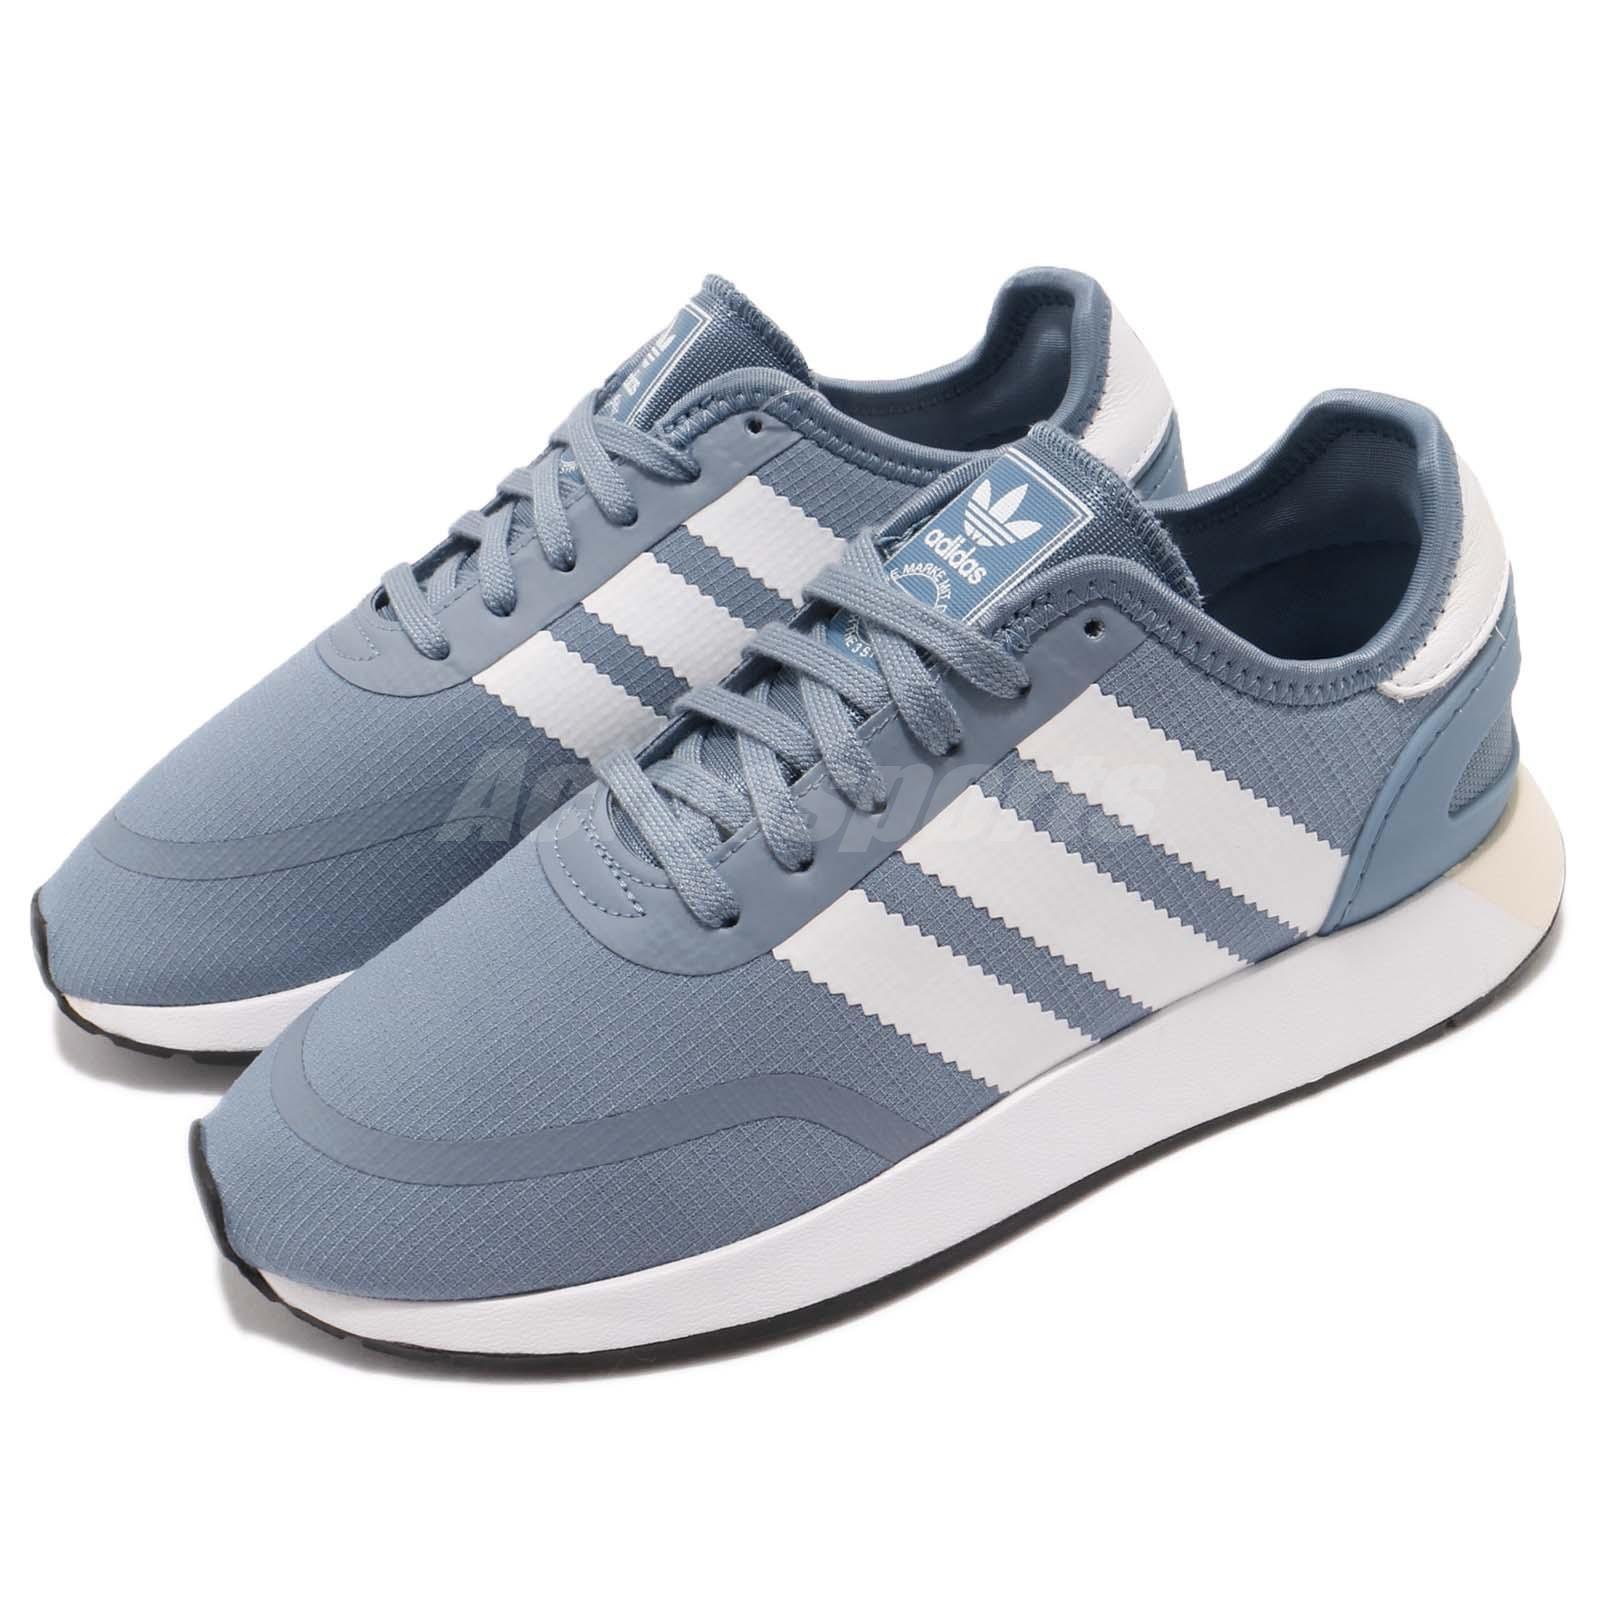 Adidas Originals N-5923 W Iniki Runner  Raw Grey White Women Running shoes B37983  best quality